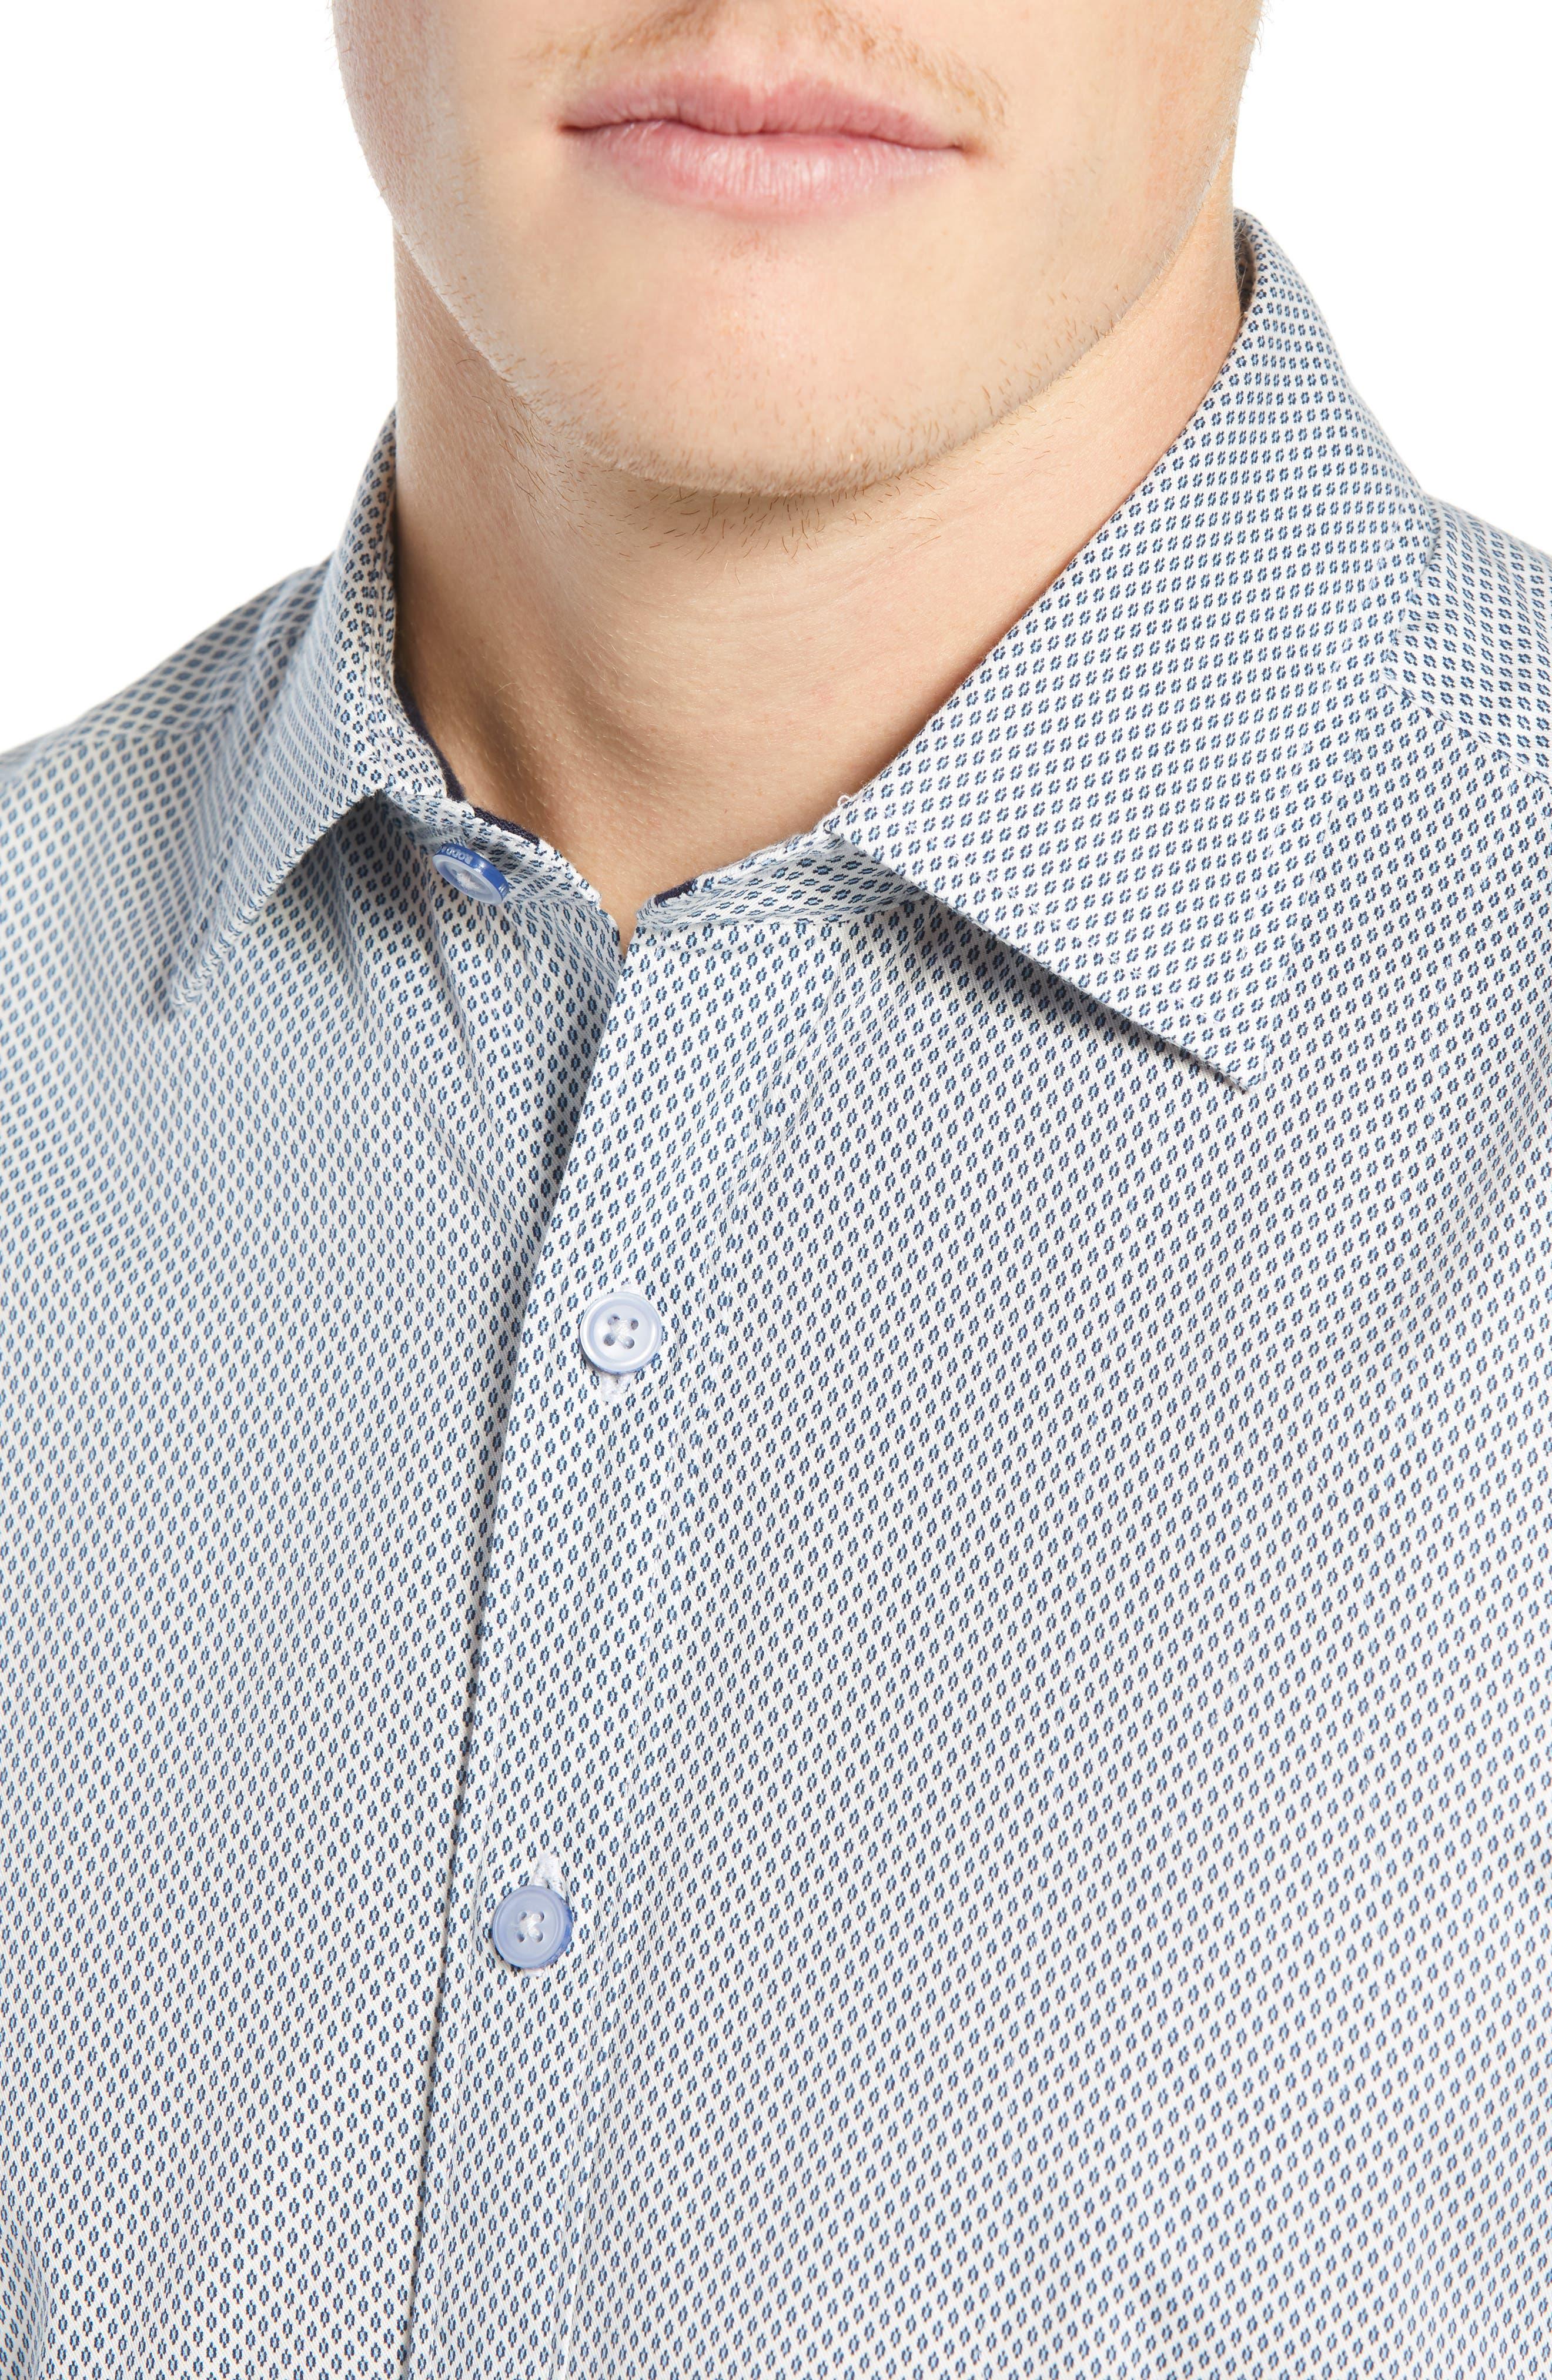 RODD & GUNN, Helston Way Regular Fit Sport Shirt, Alternate thumbnail 2, color, SNOW